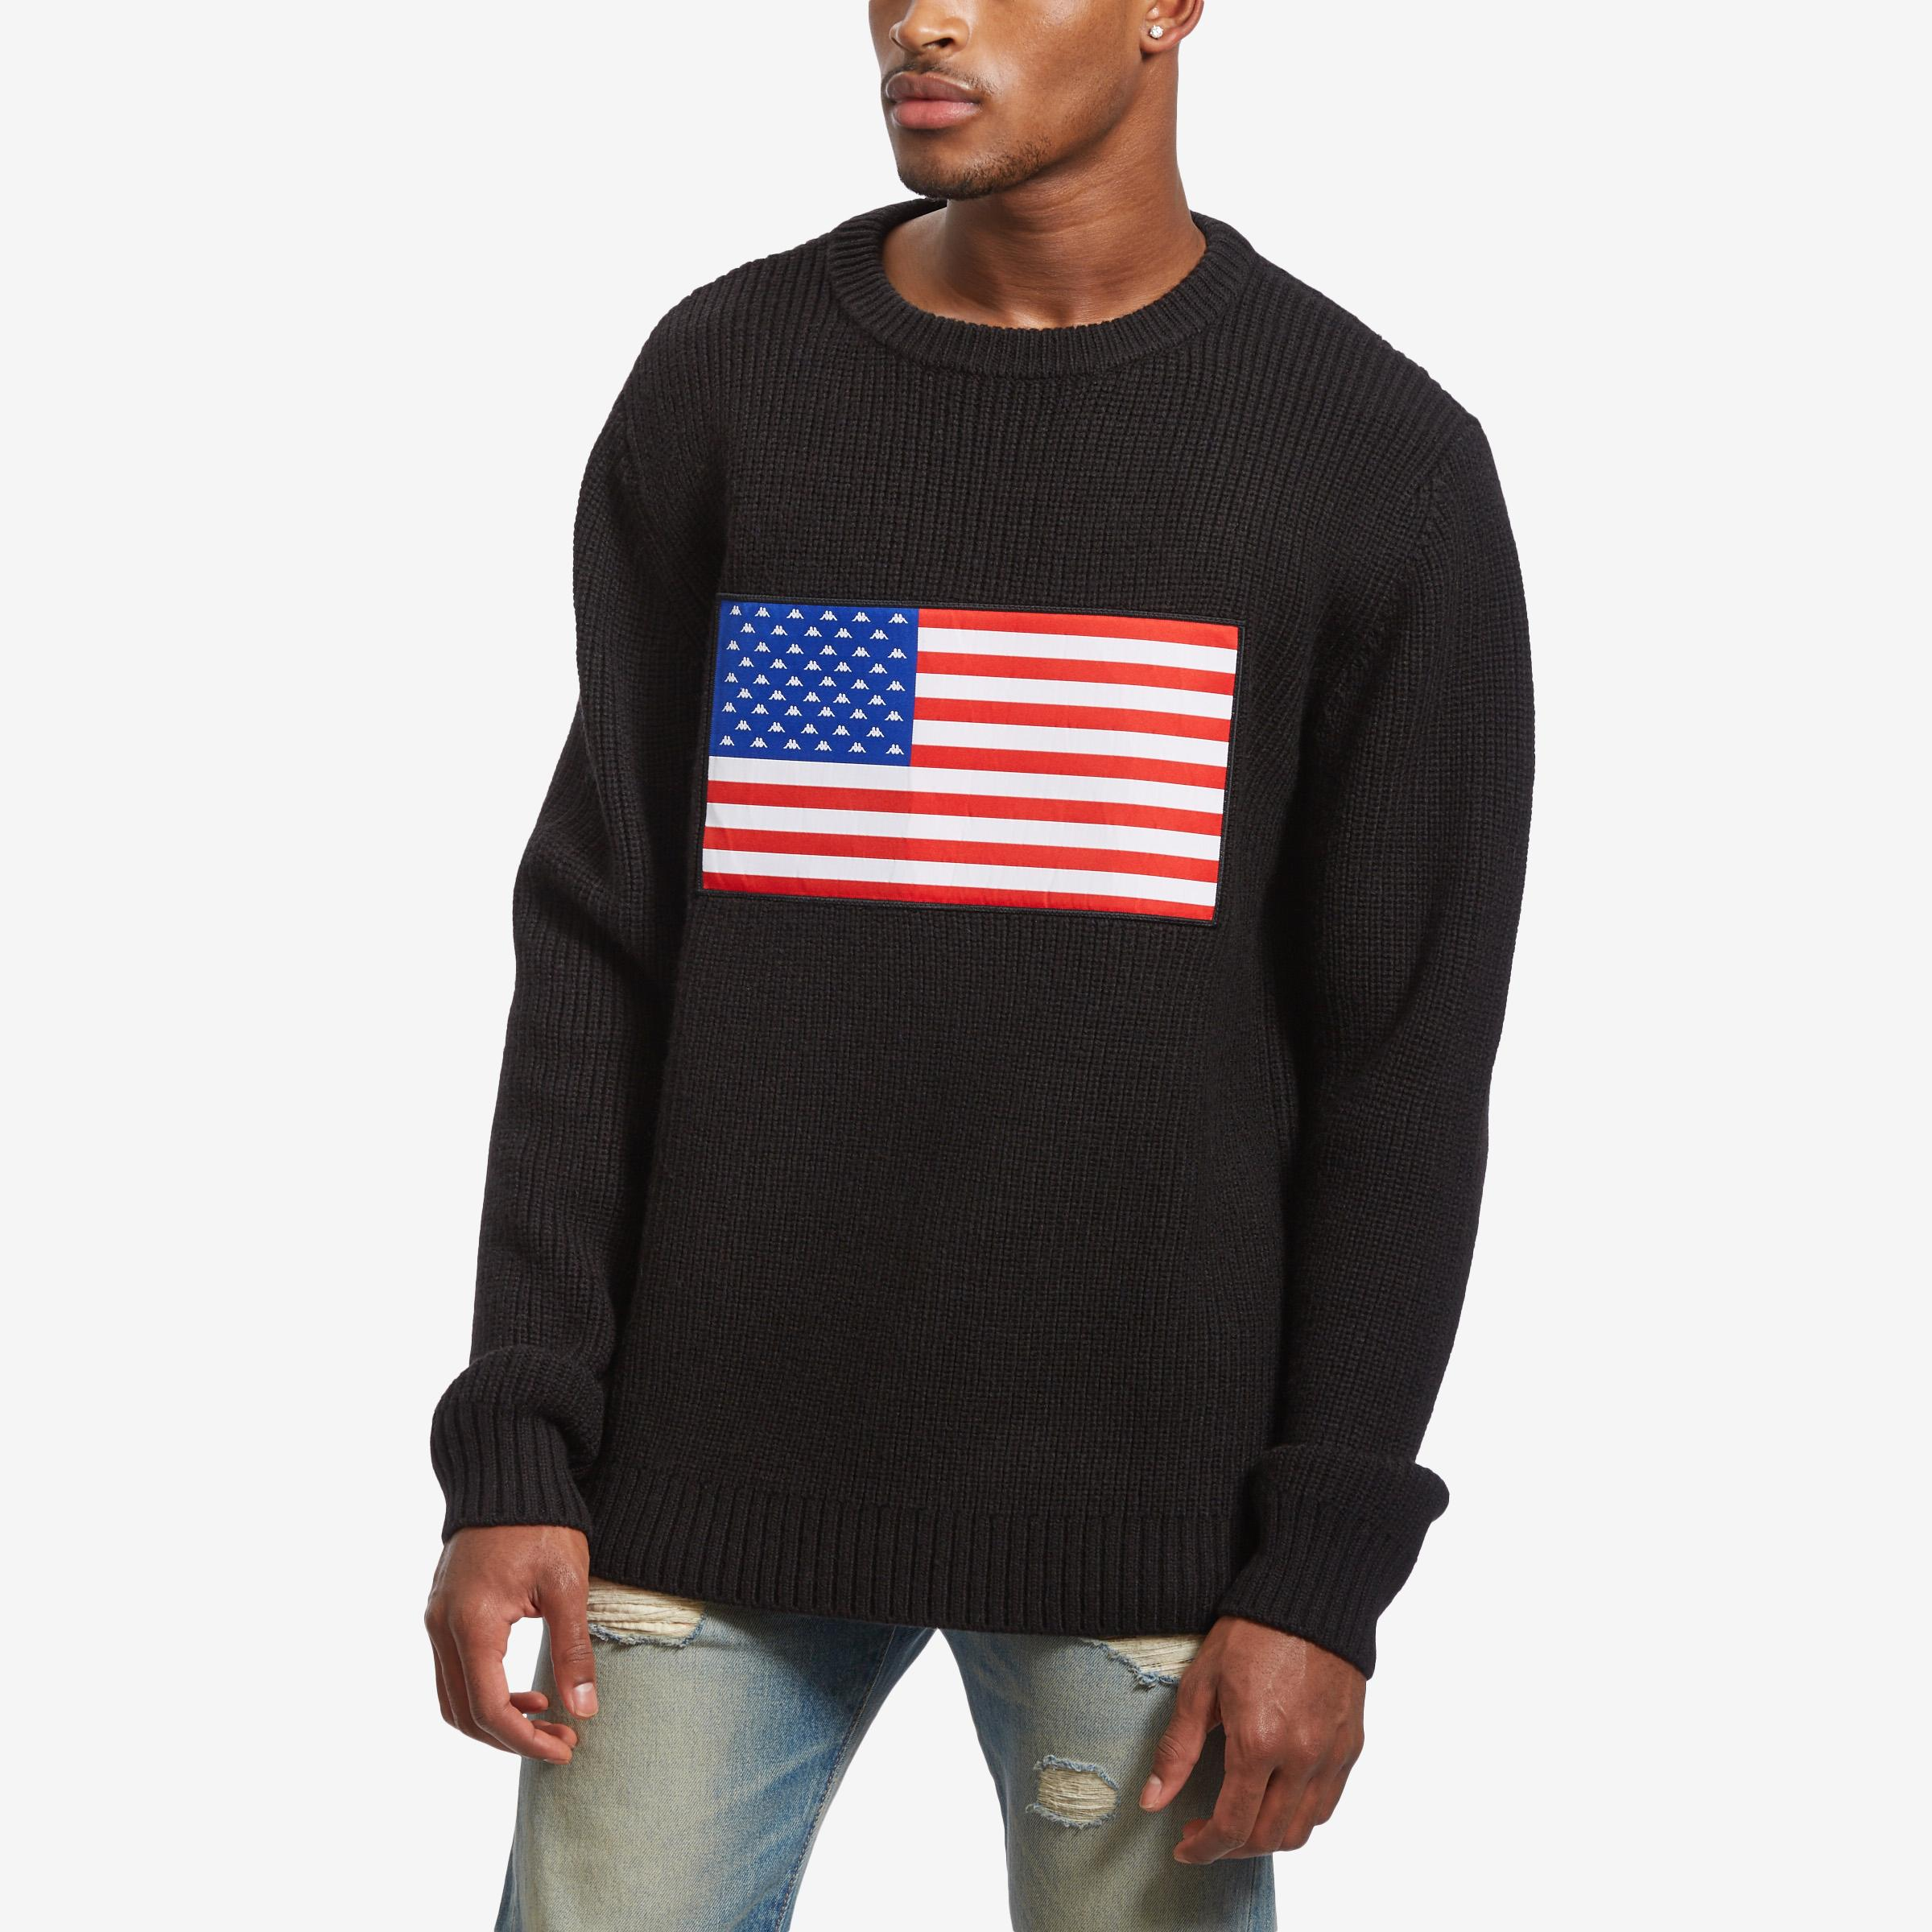 Authentic La Besarty Sweater